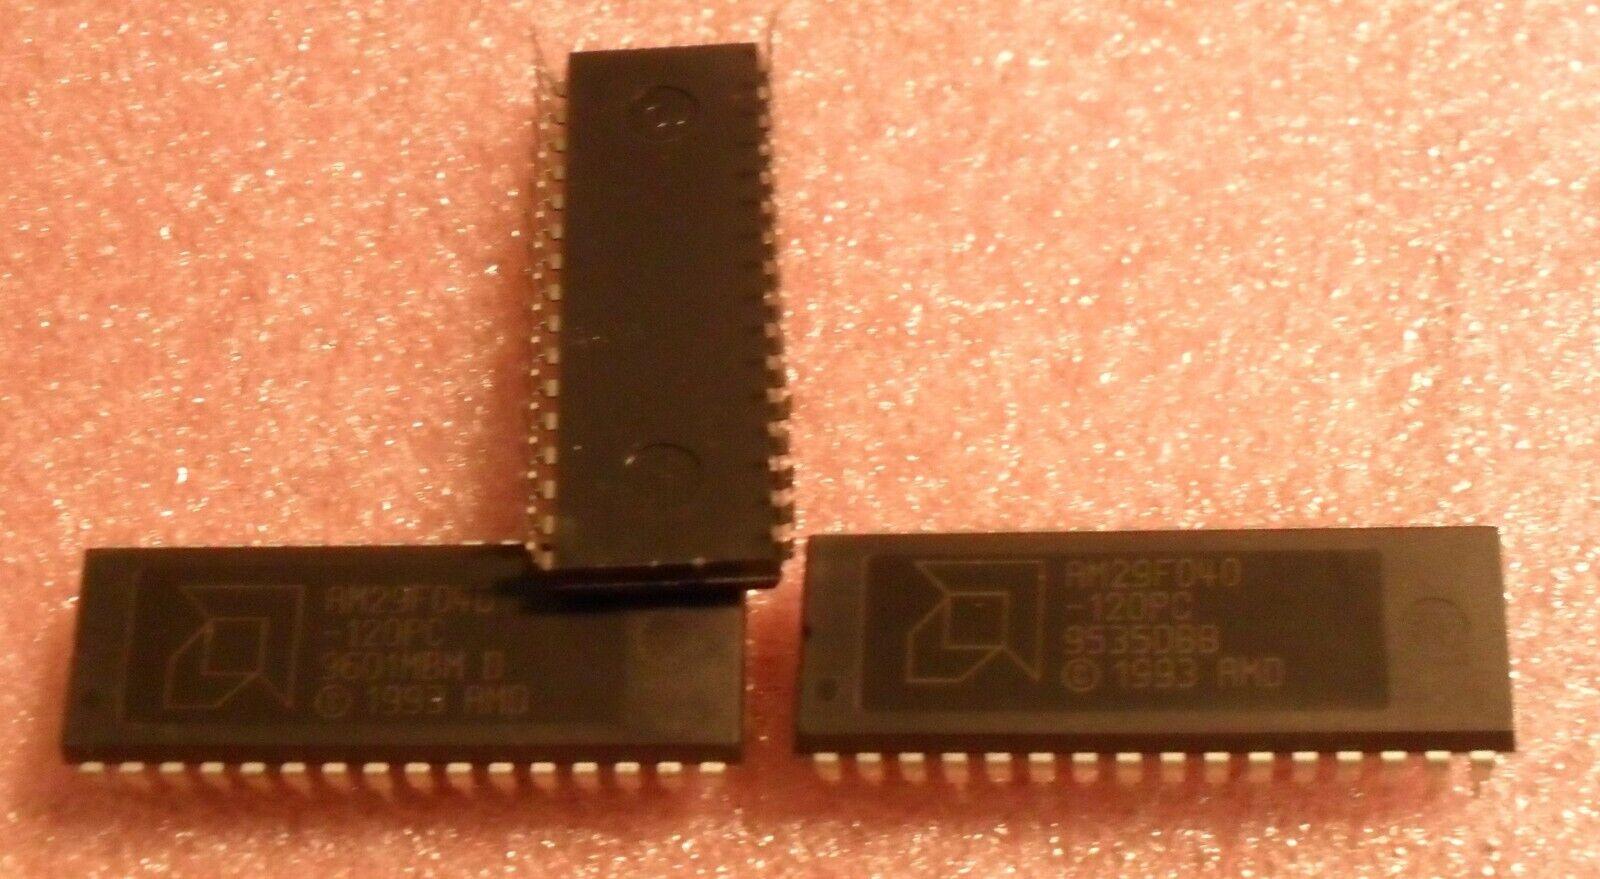 Toshiba TMM142P 256x4 nonvolatile SRAM